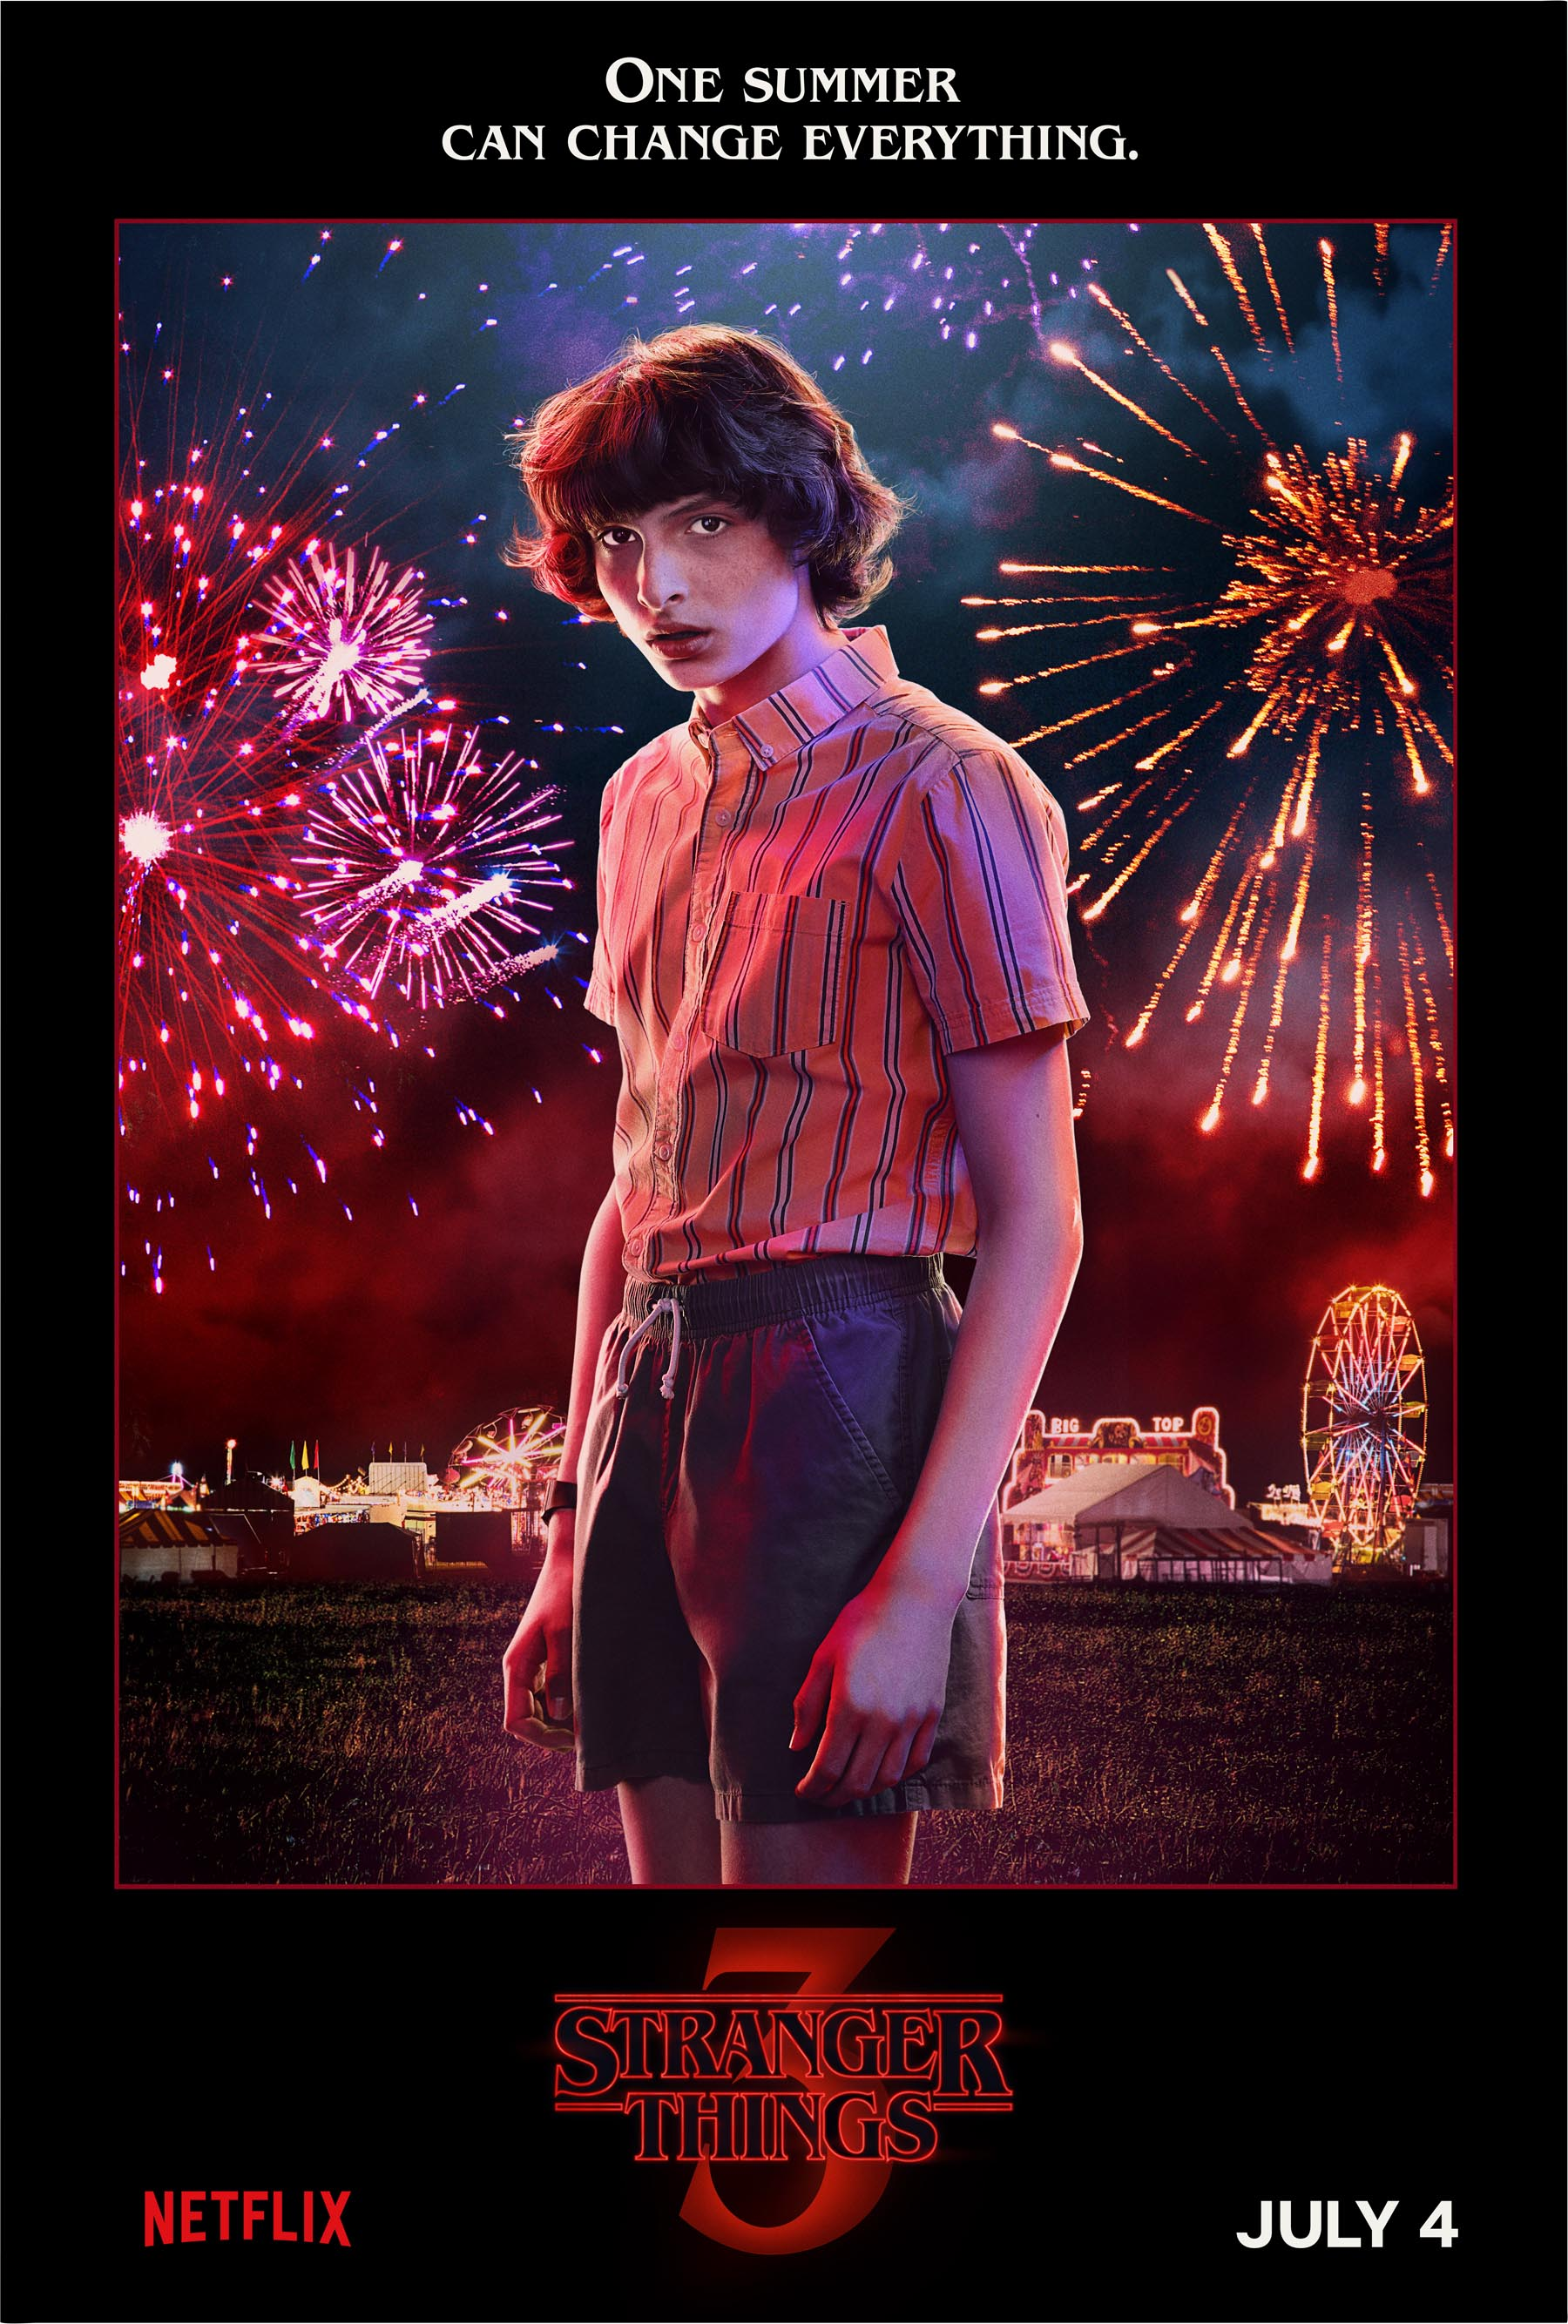 Stranger Things 3 Character poster CR: Netflix